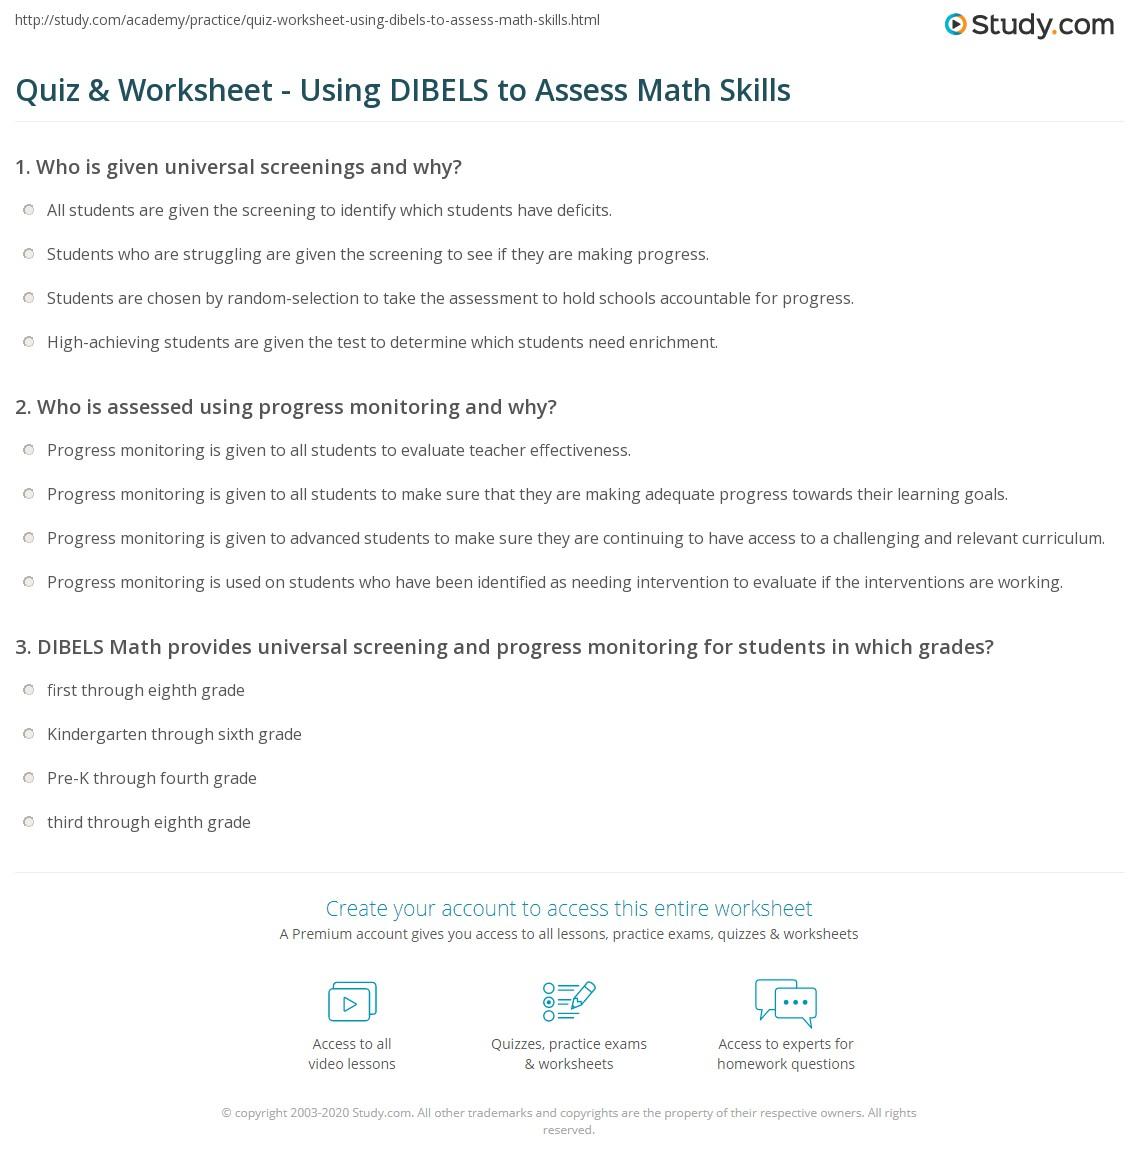 worksheet Basic Math Skills Worksheets quiz worksheet using dibels to assess math skills study com print measuring with dynamic indicators of basic early literacy worksheet